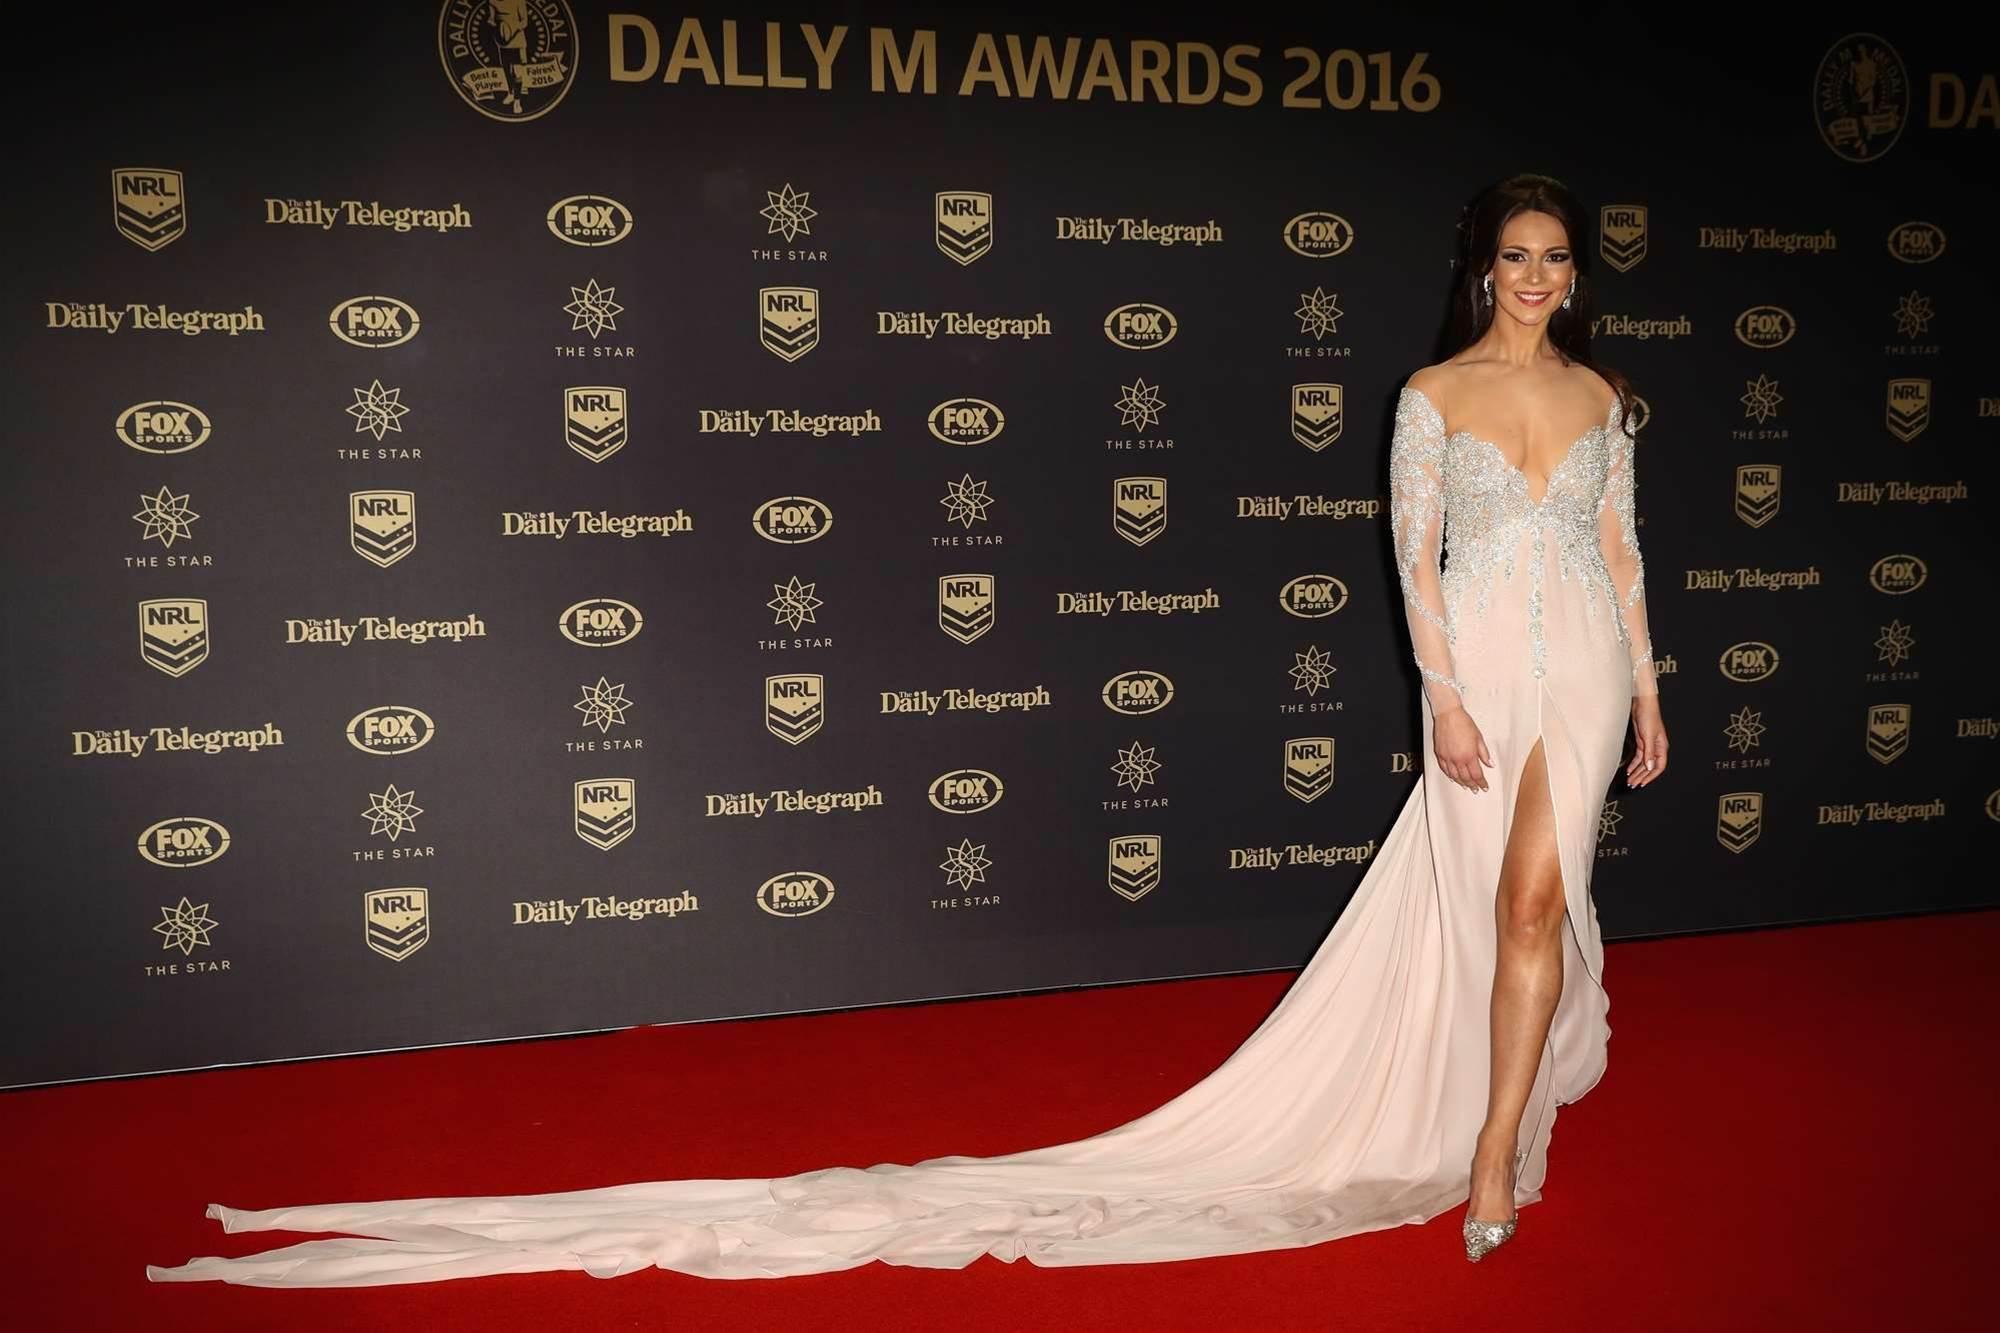 Dally M Awards red carpet